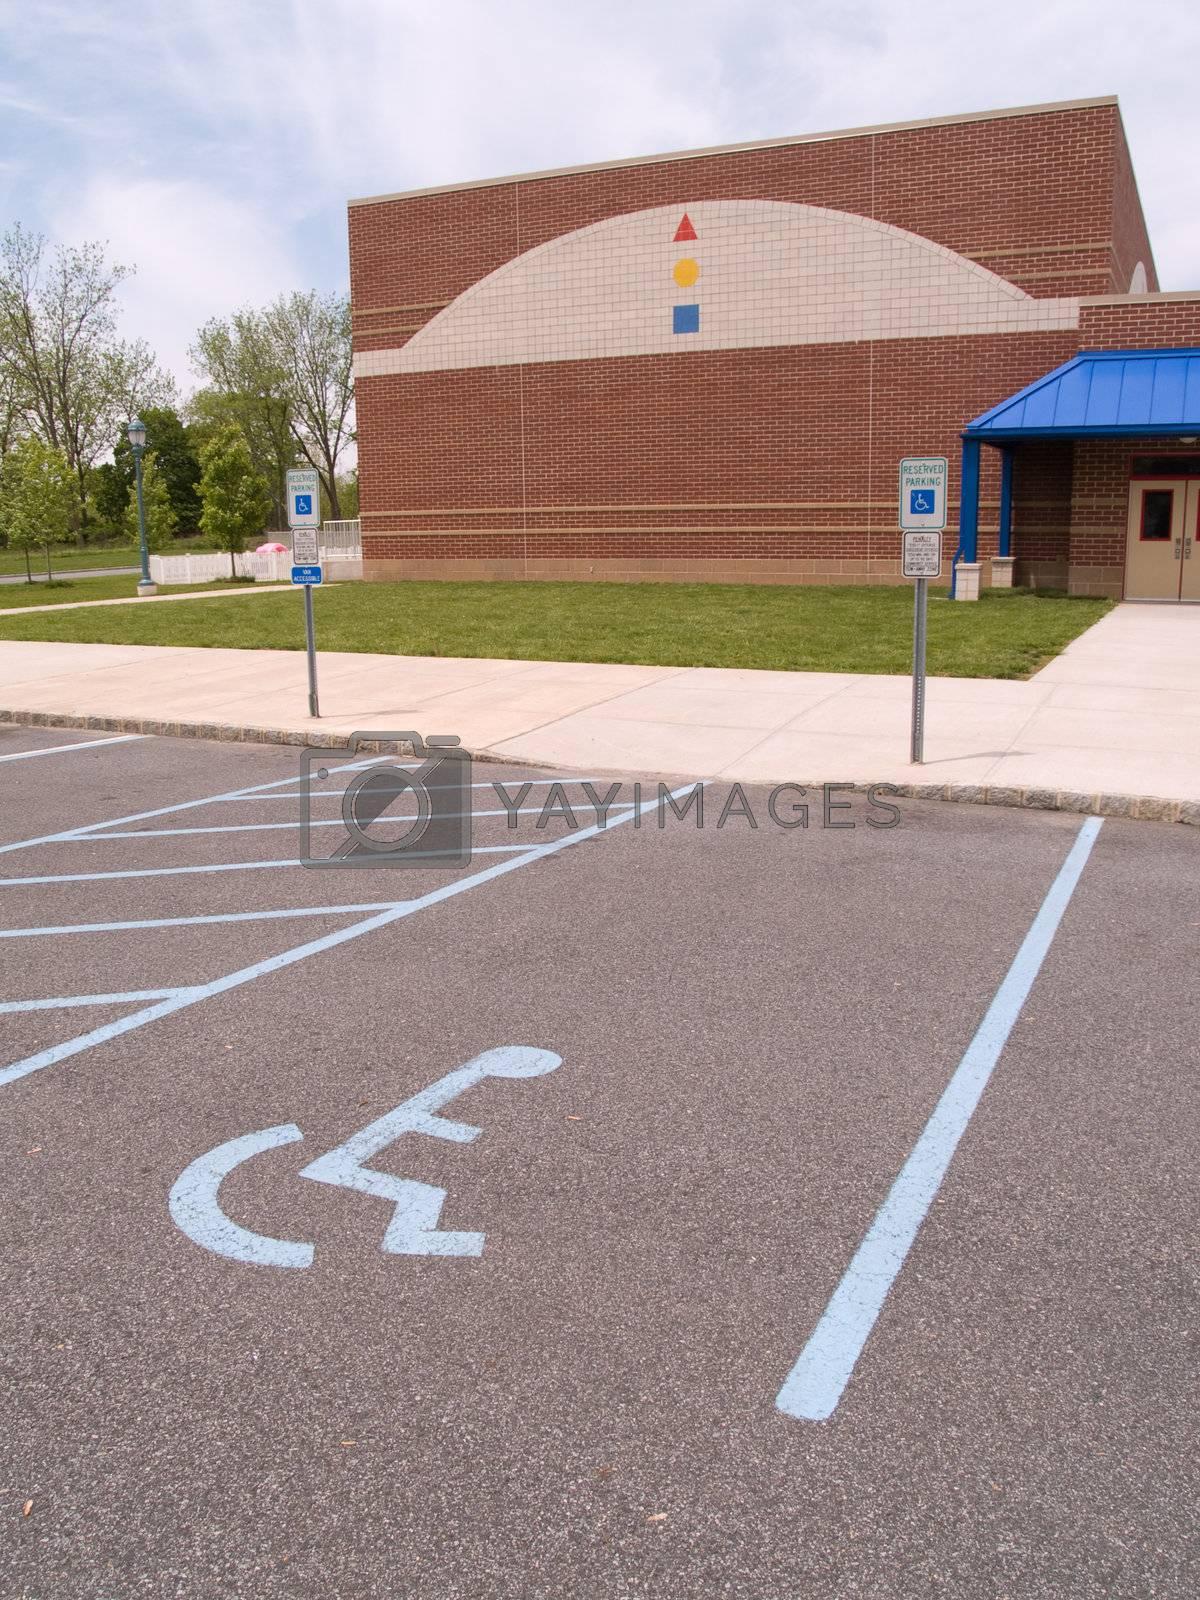 a handicapped parking spot by an school